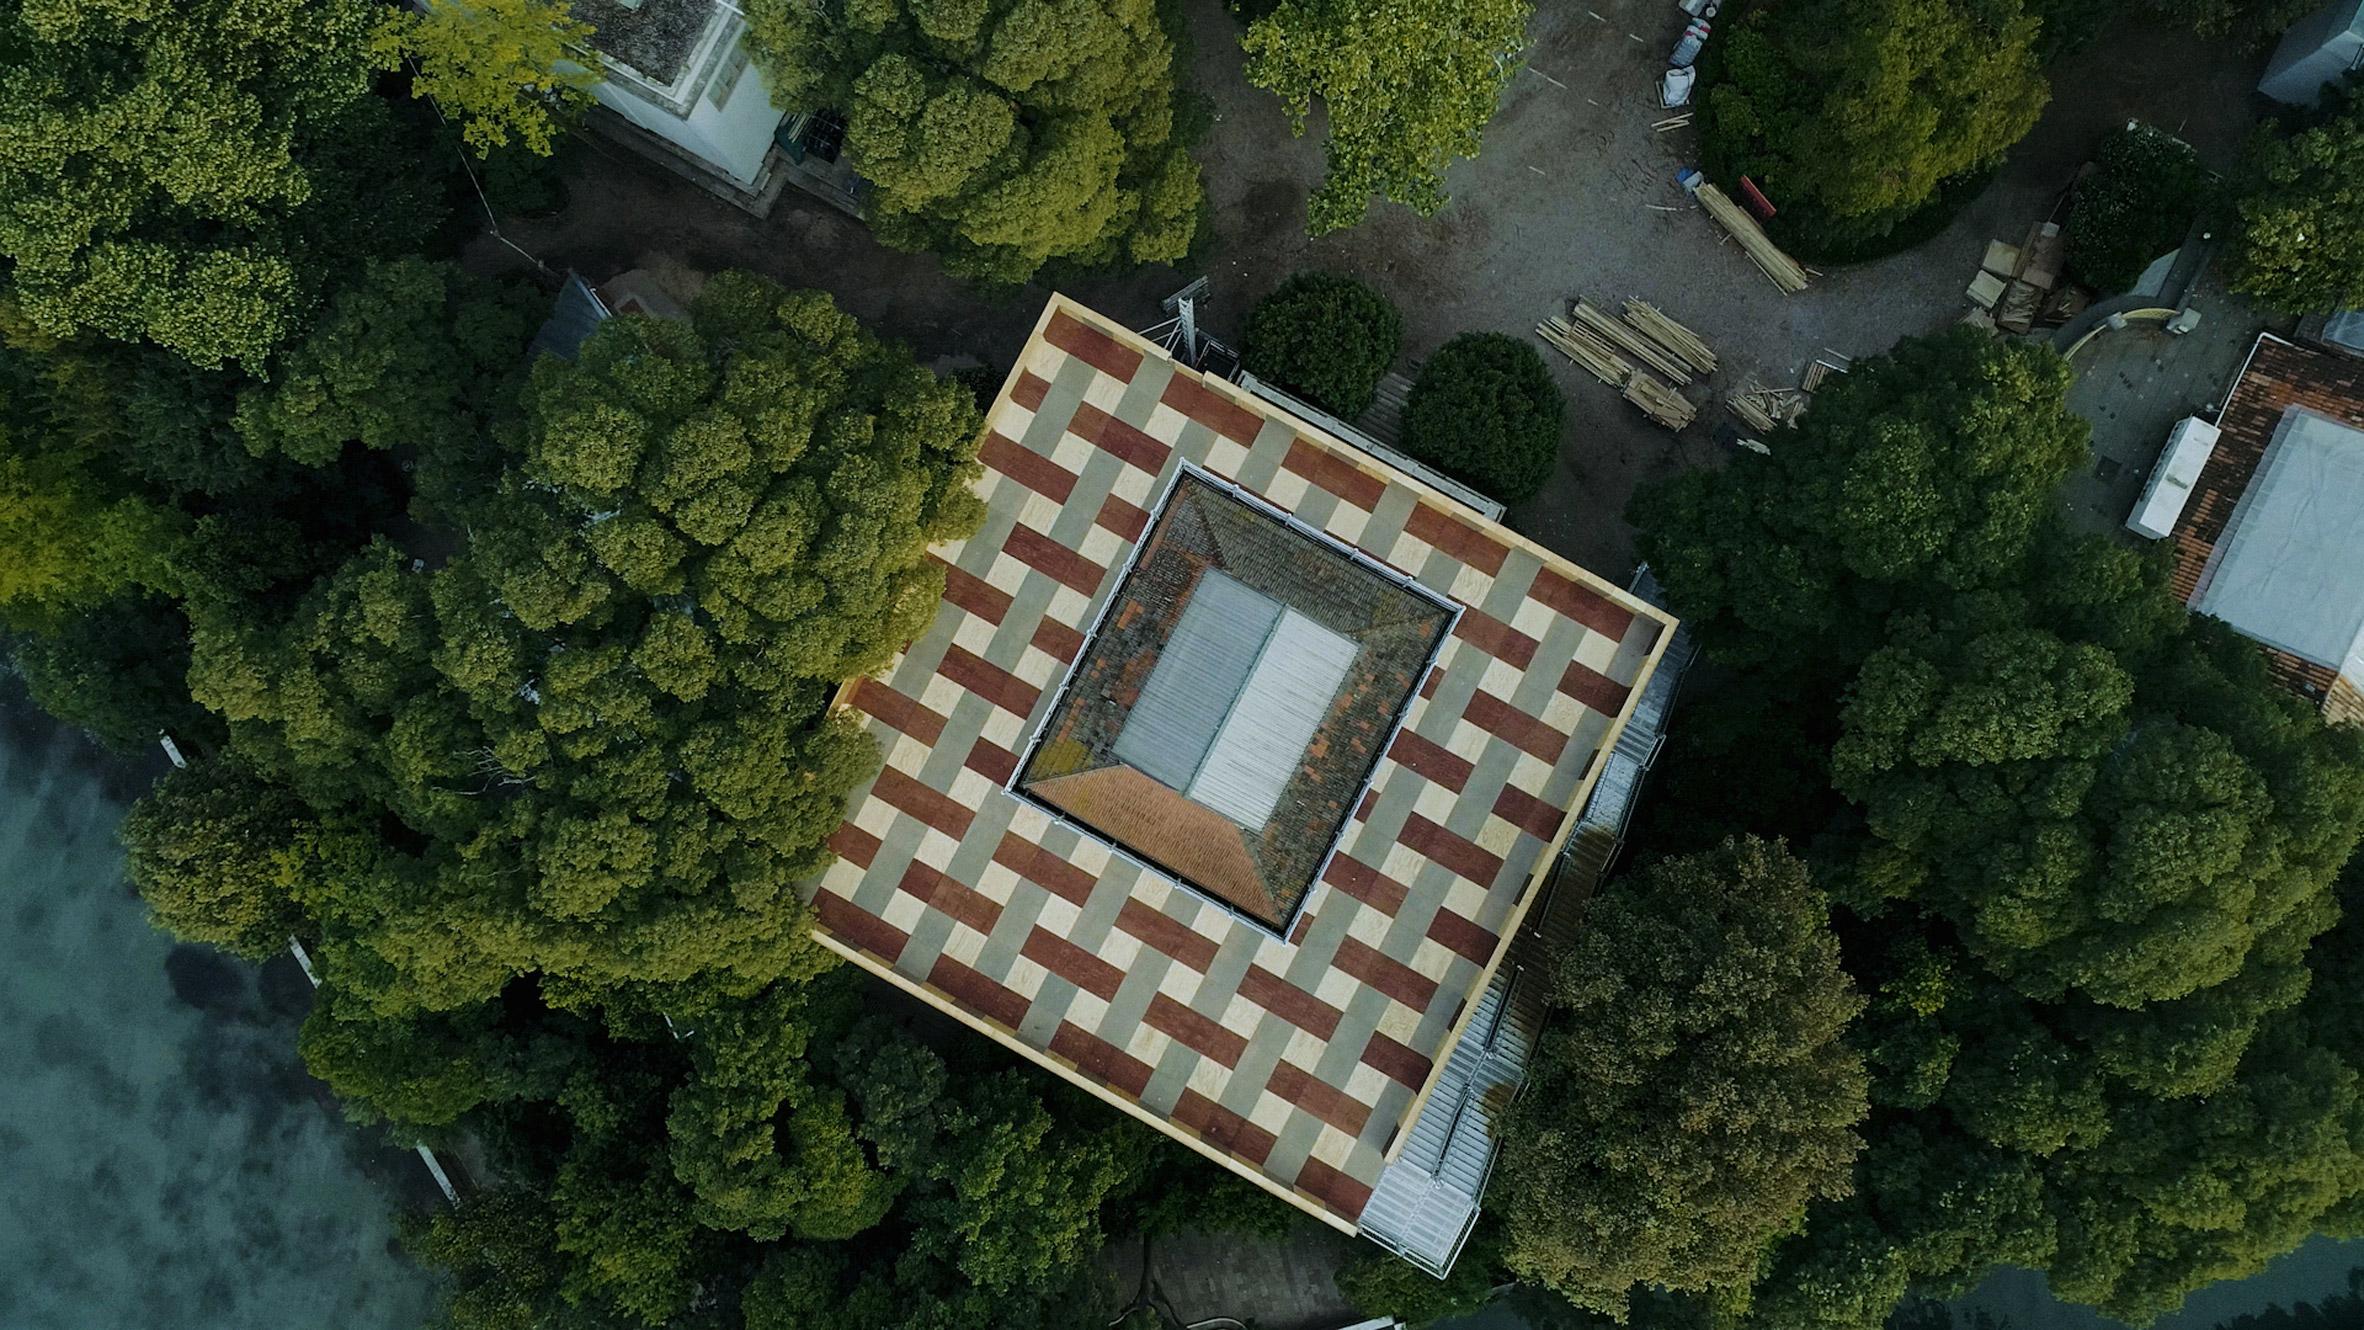 British Pavilion Venice Architecture Biennale, drone photography by Cultureshock Media